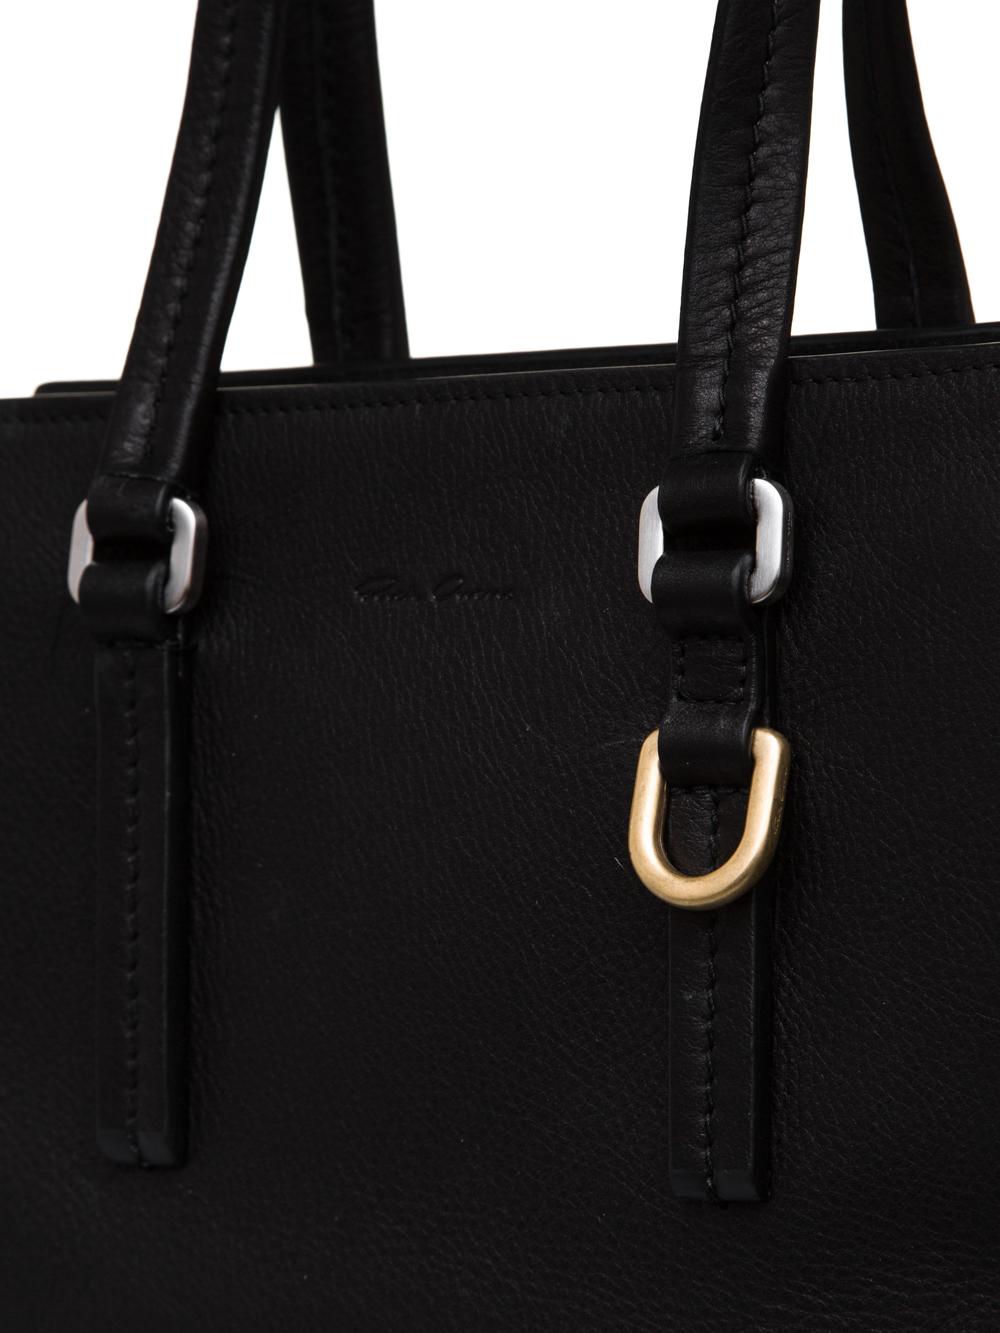 RICK OWENS FW18 SISYPHUS MICRO EDITH BAG IN BLACK CALF LEATHER